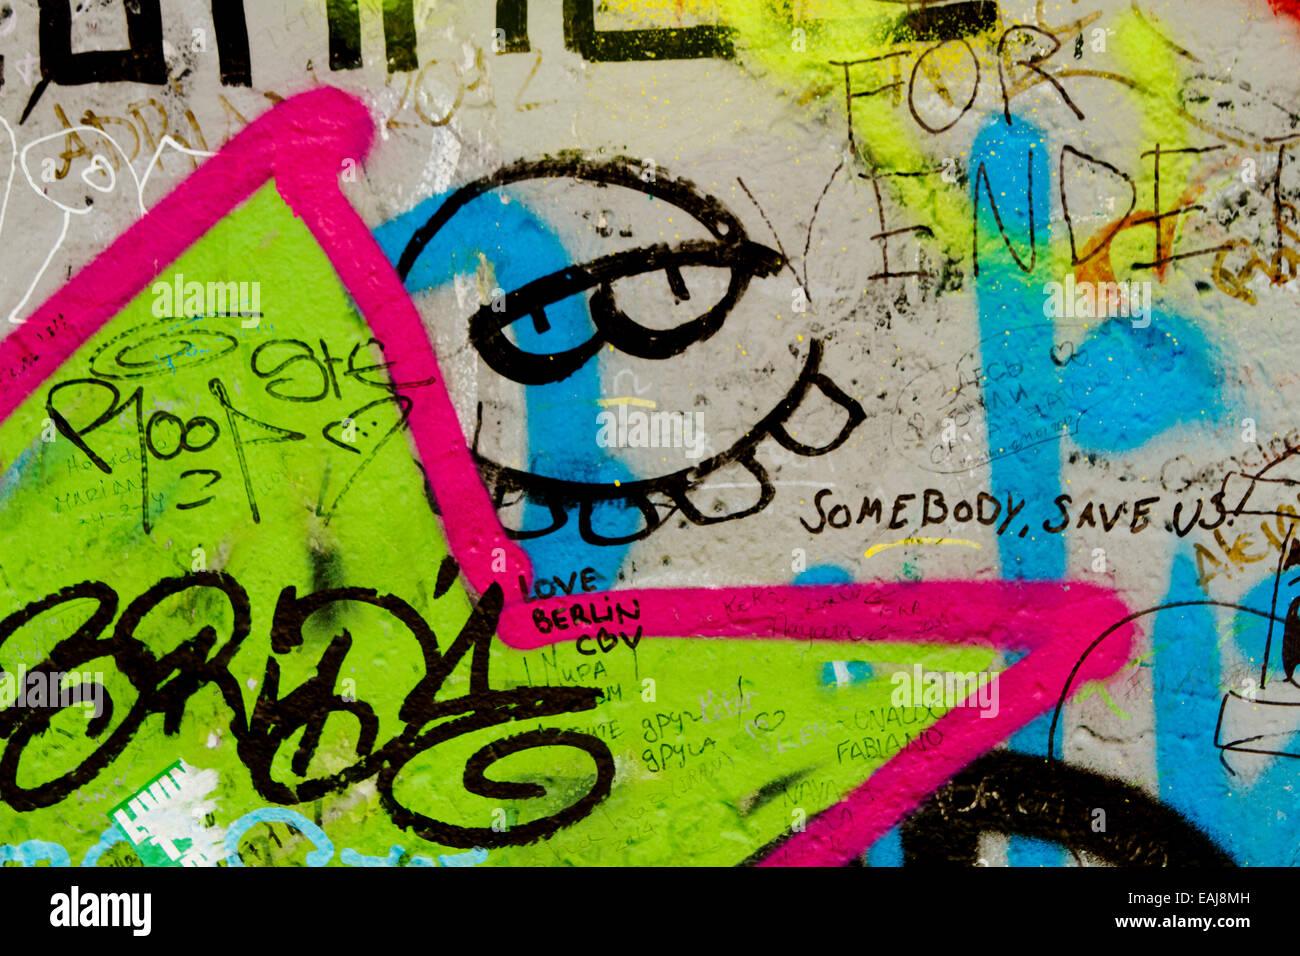 Graffiti street art berlin wall tags cartoon 80s